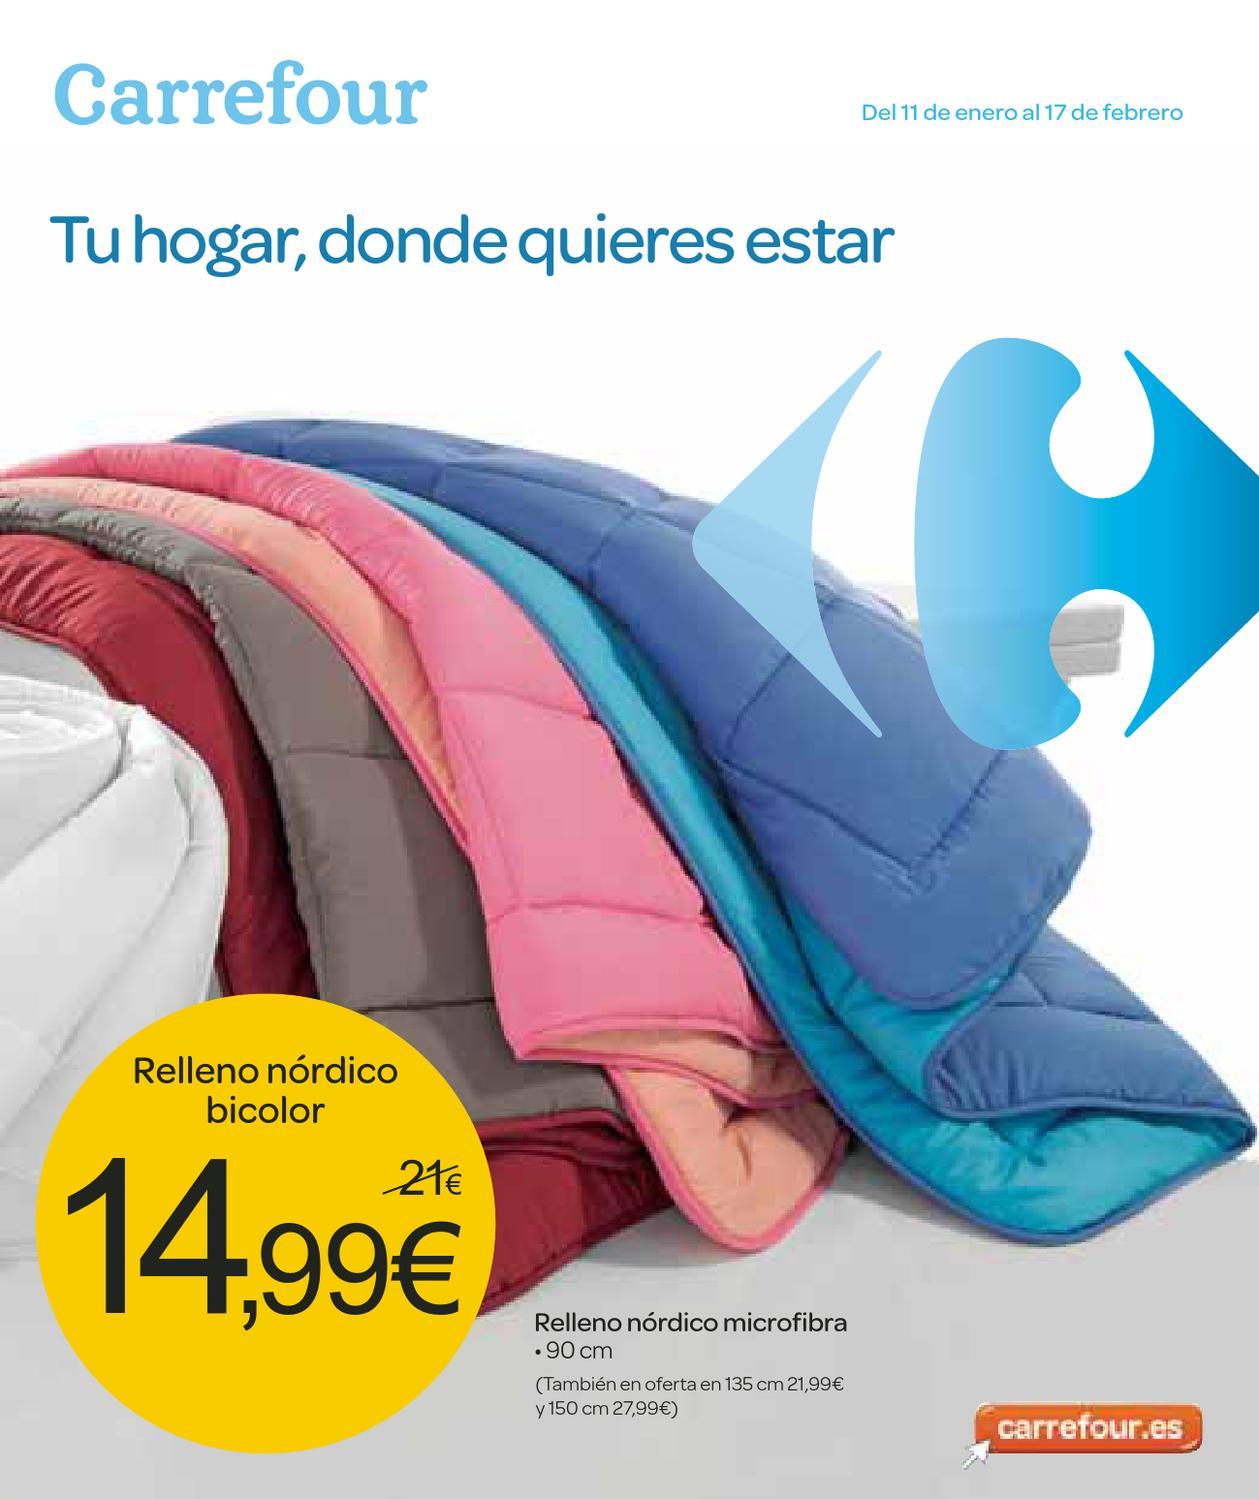 Carrefour catalogo ofertas para el hogar by hackos ecc issuu - Relleno nordico carrefour ...